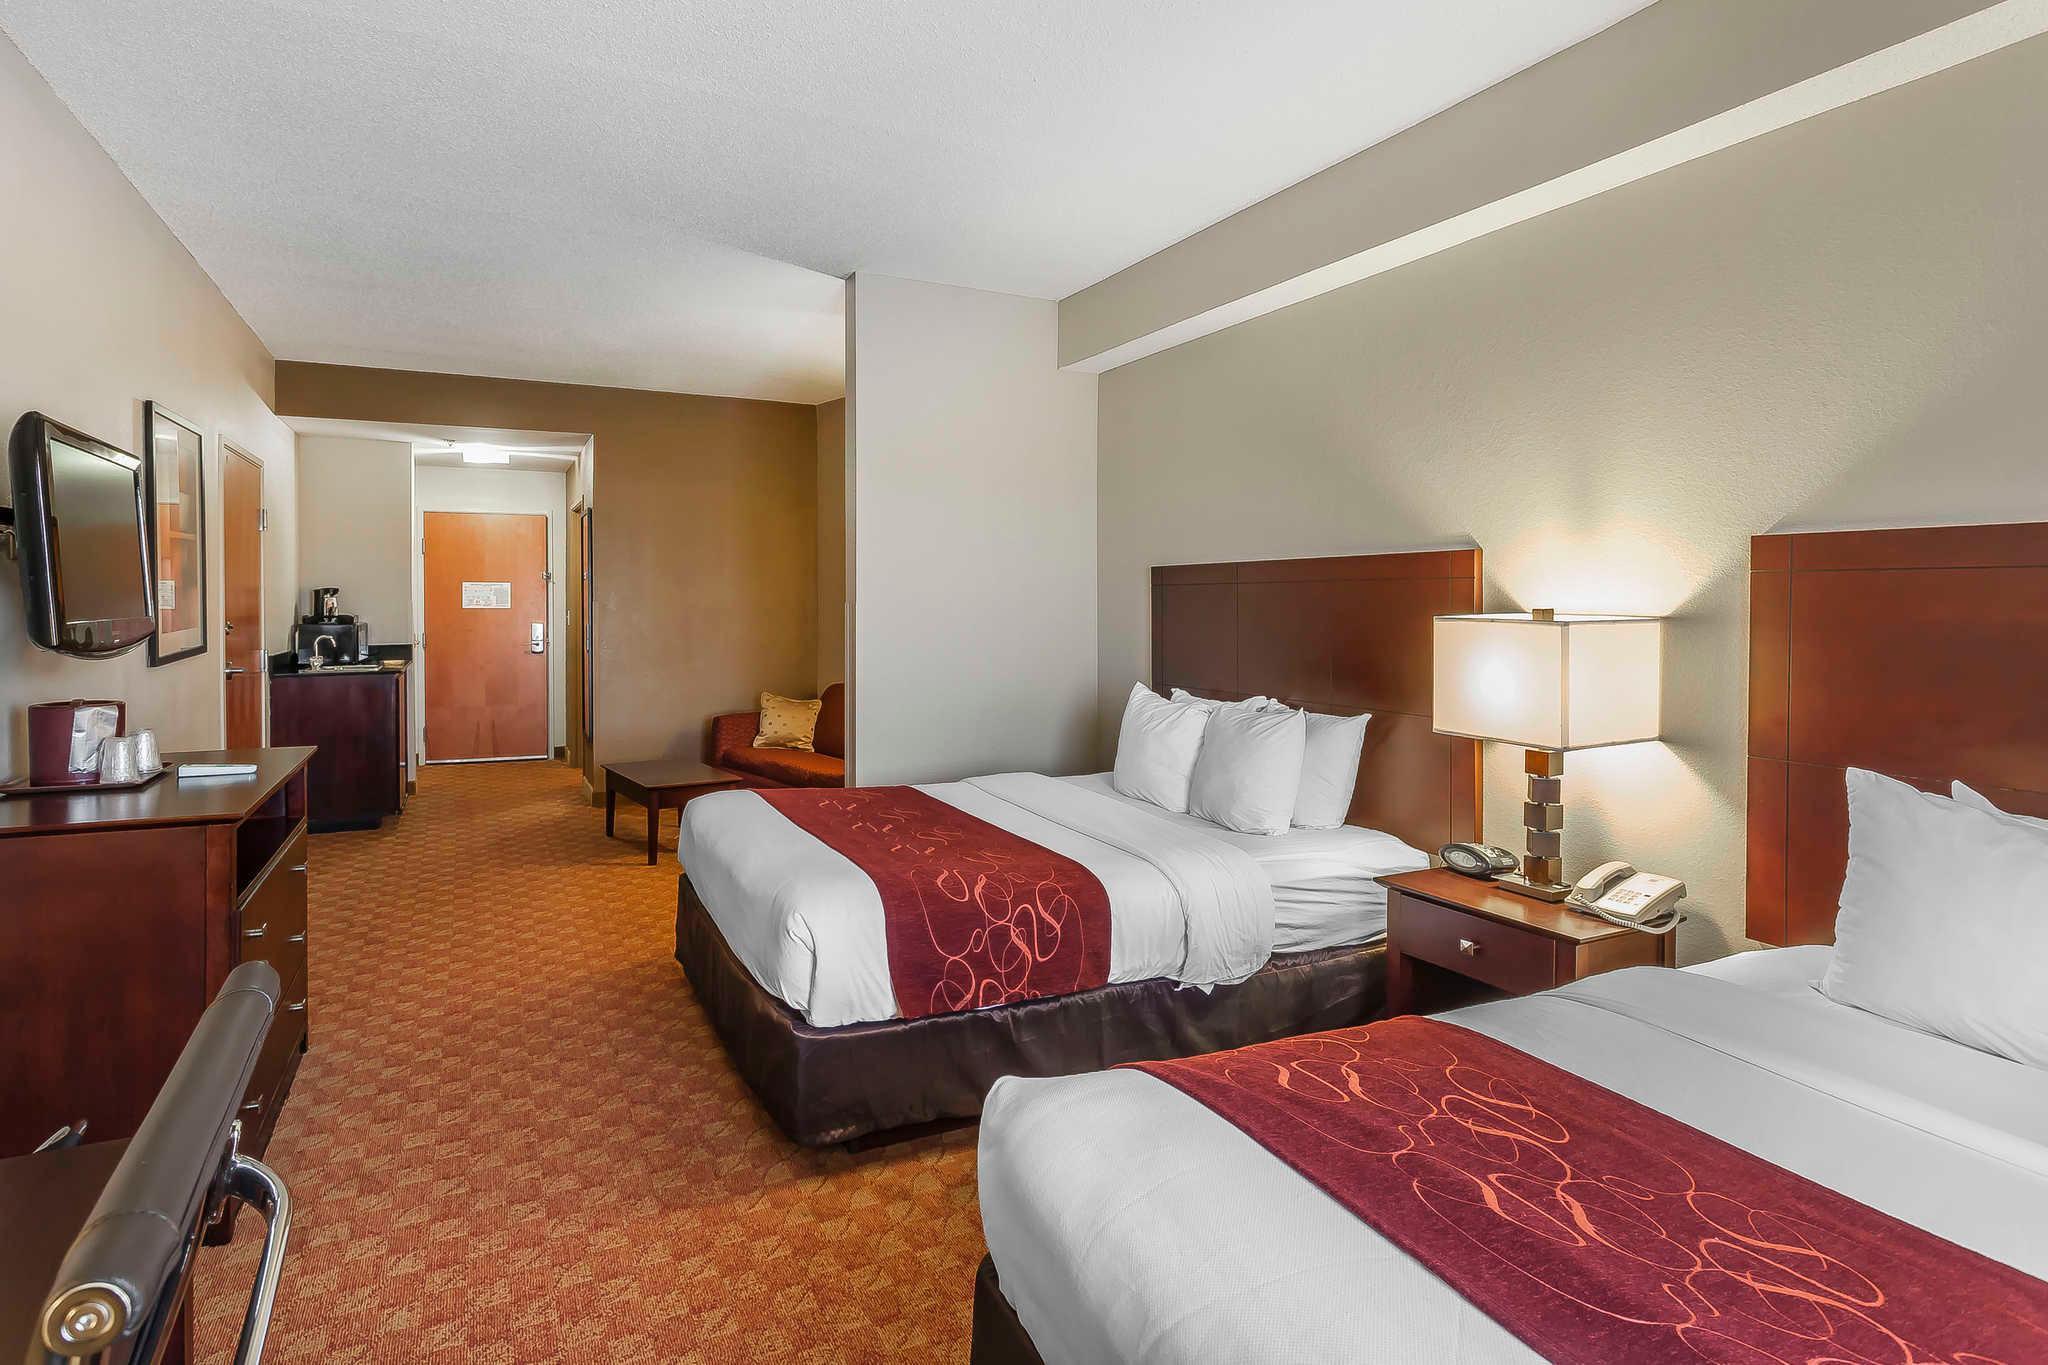 comfort suites suffolk chesapeake suffolk va from 64 save rh agoda com